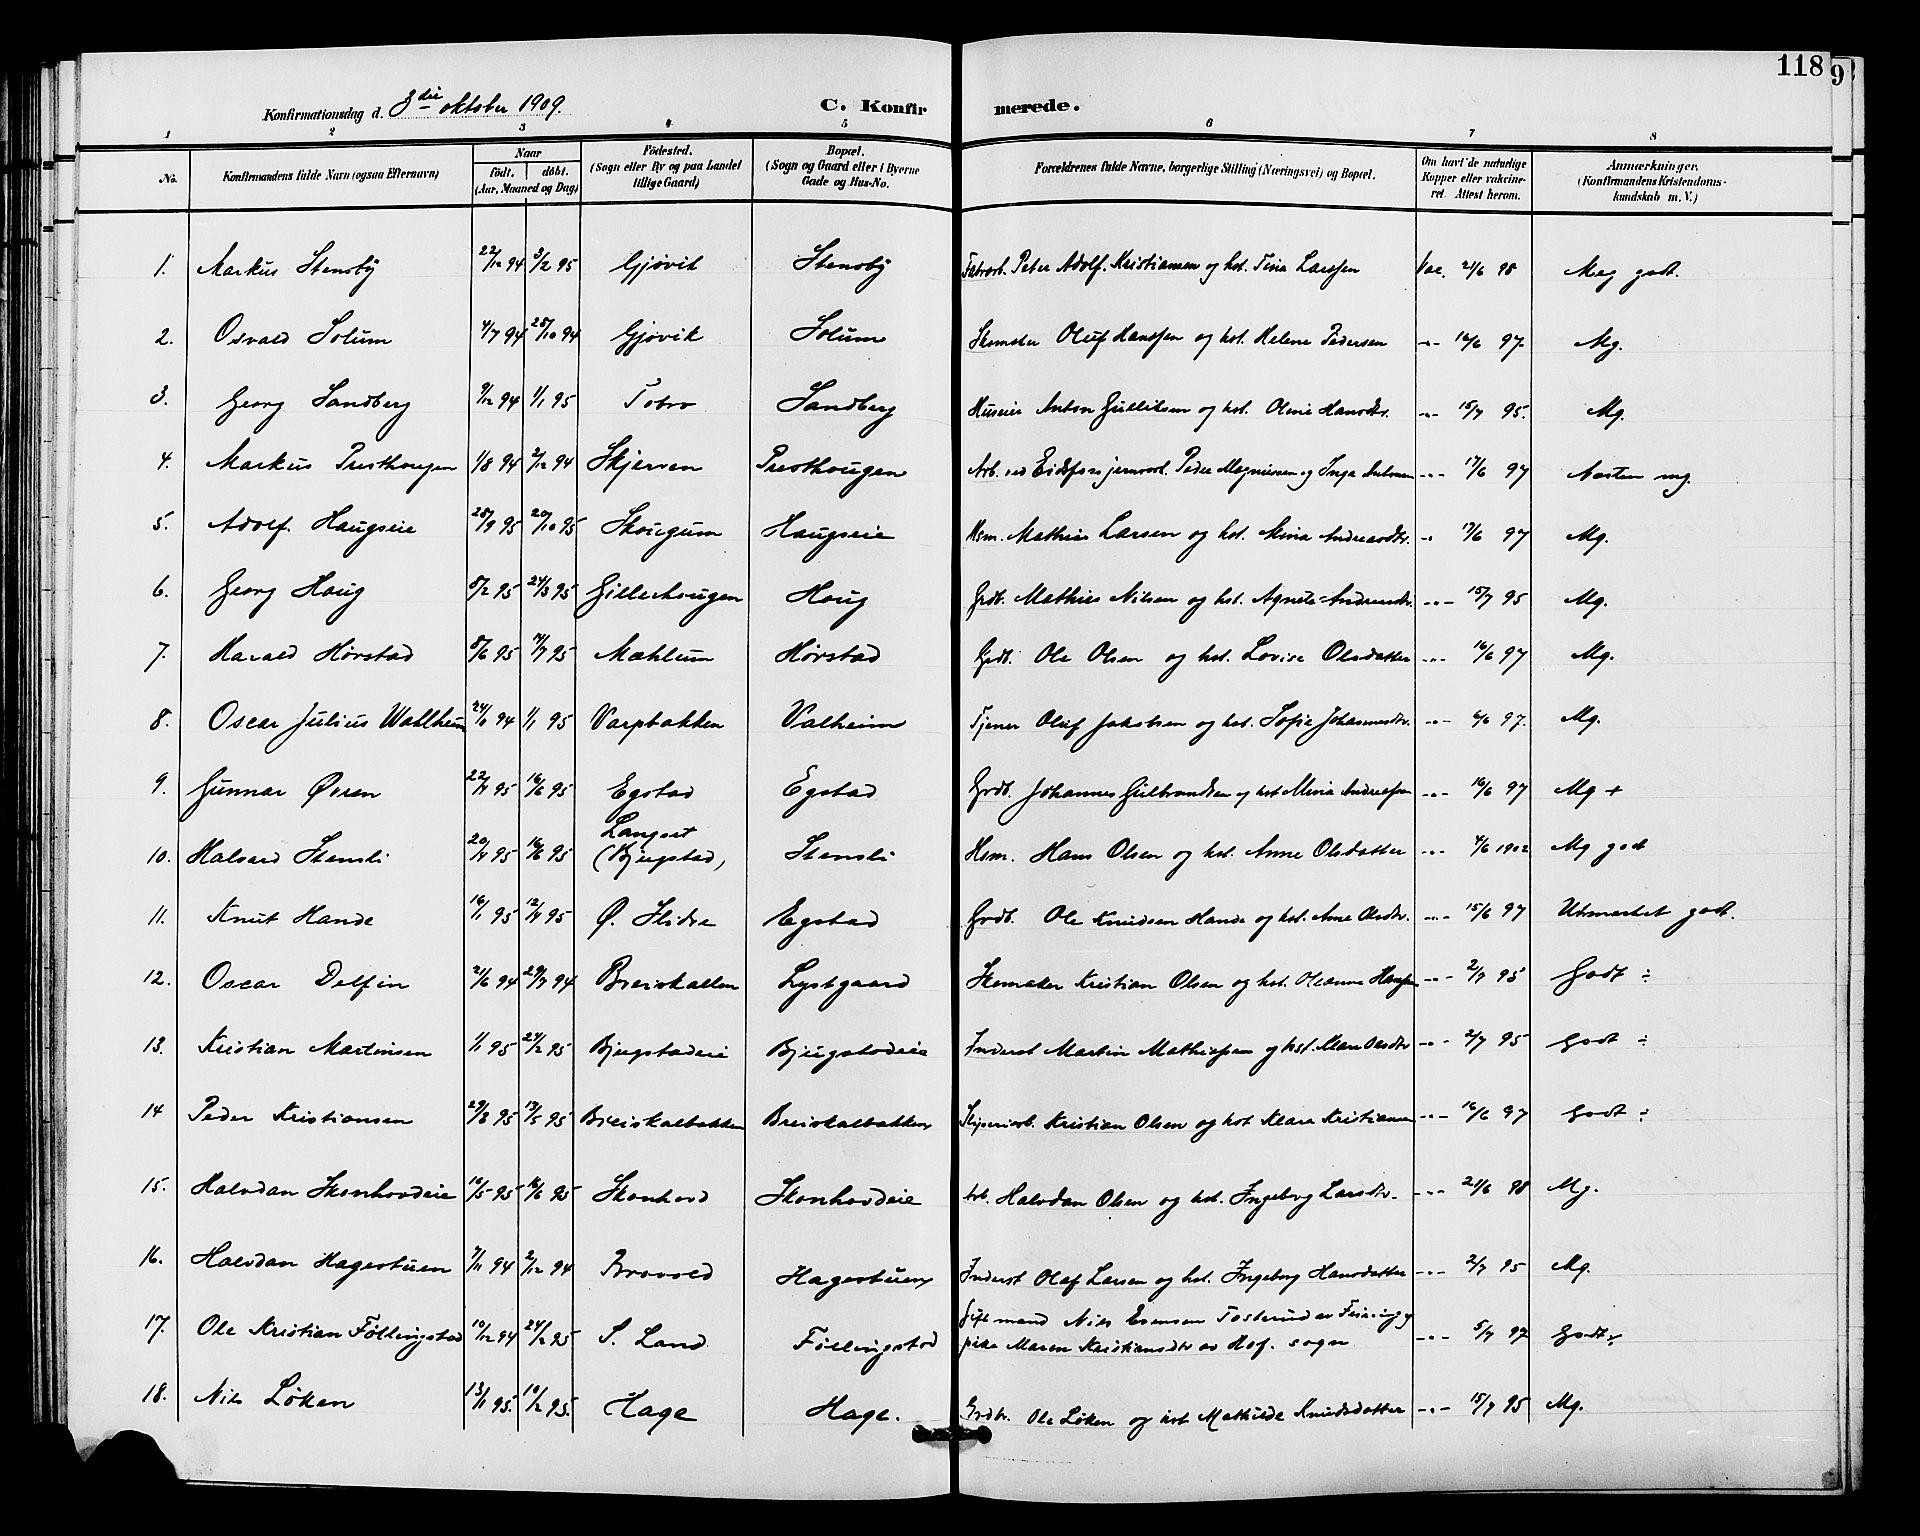 SAH, Vardal prestekontor, H/Ha/Hab/L0011: Klokkerbok nr. 11, 1899-1913, s. 118